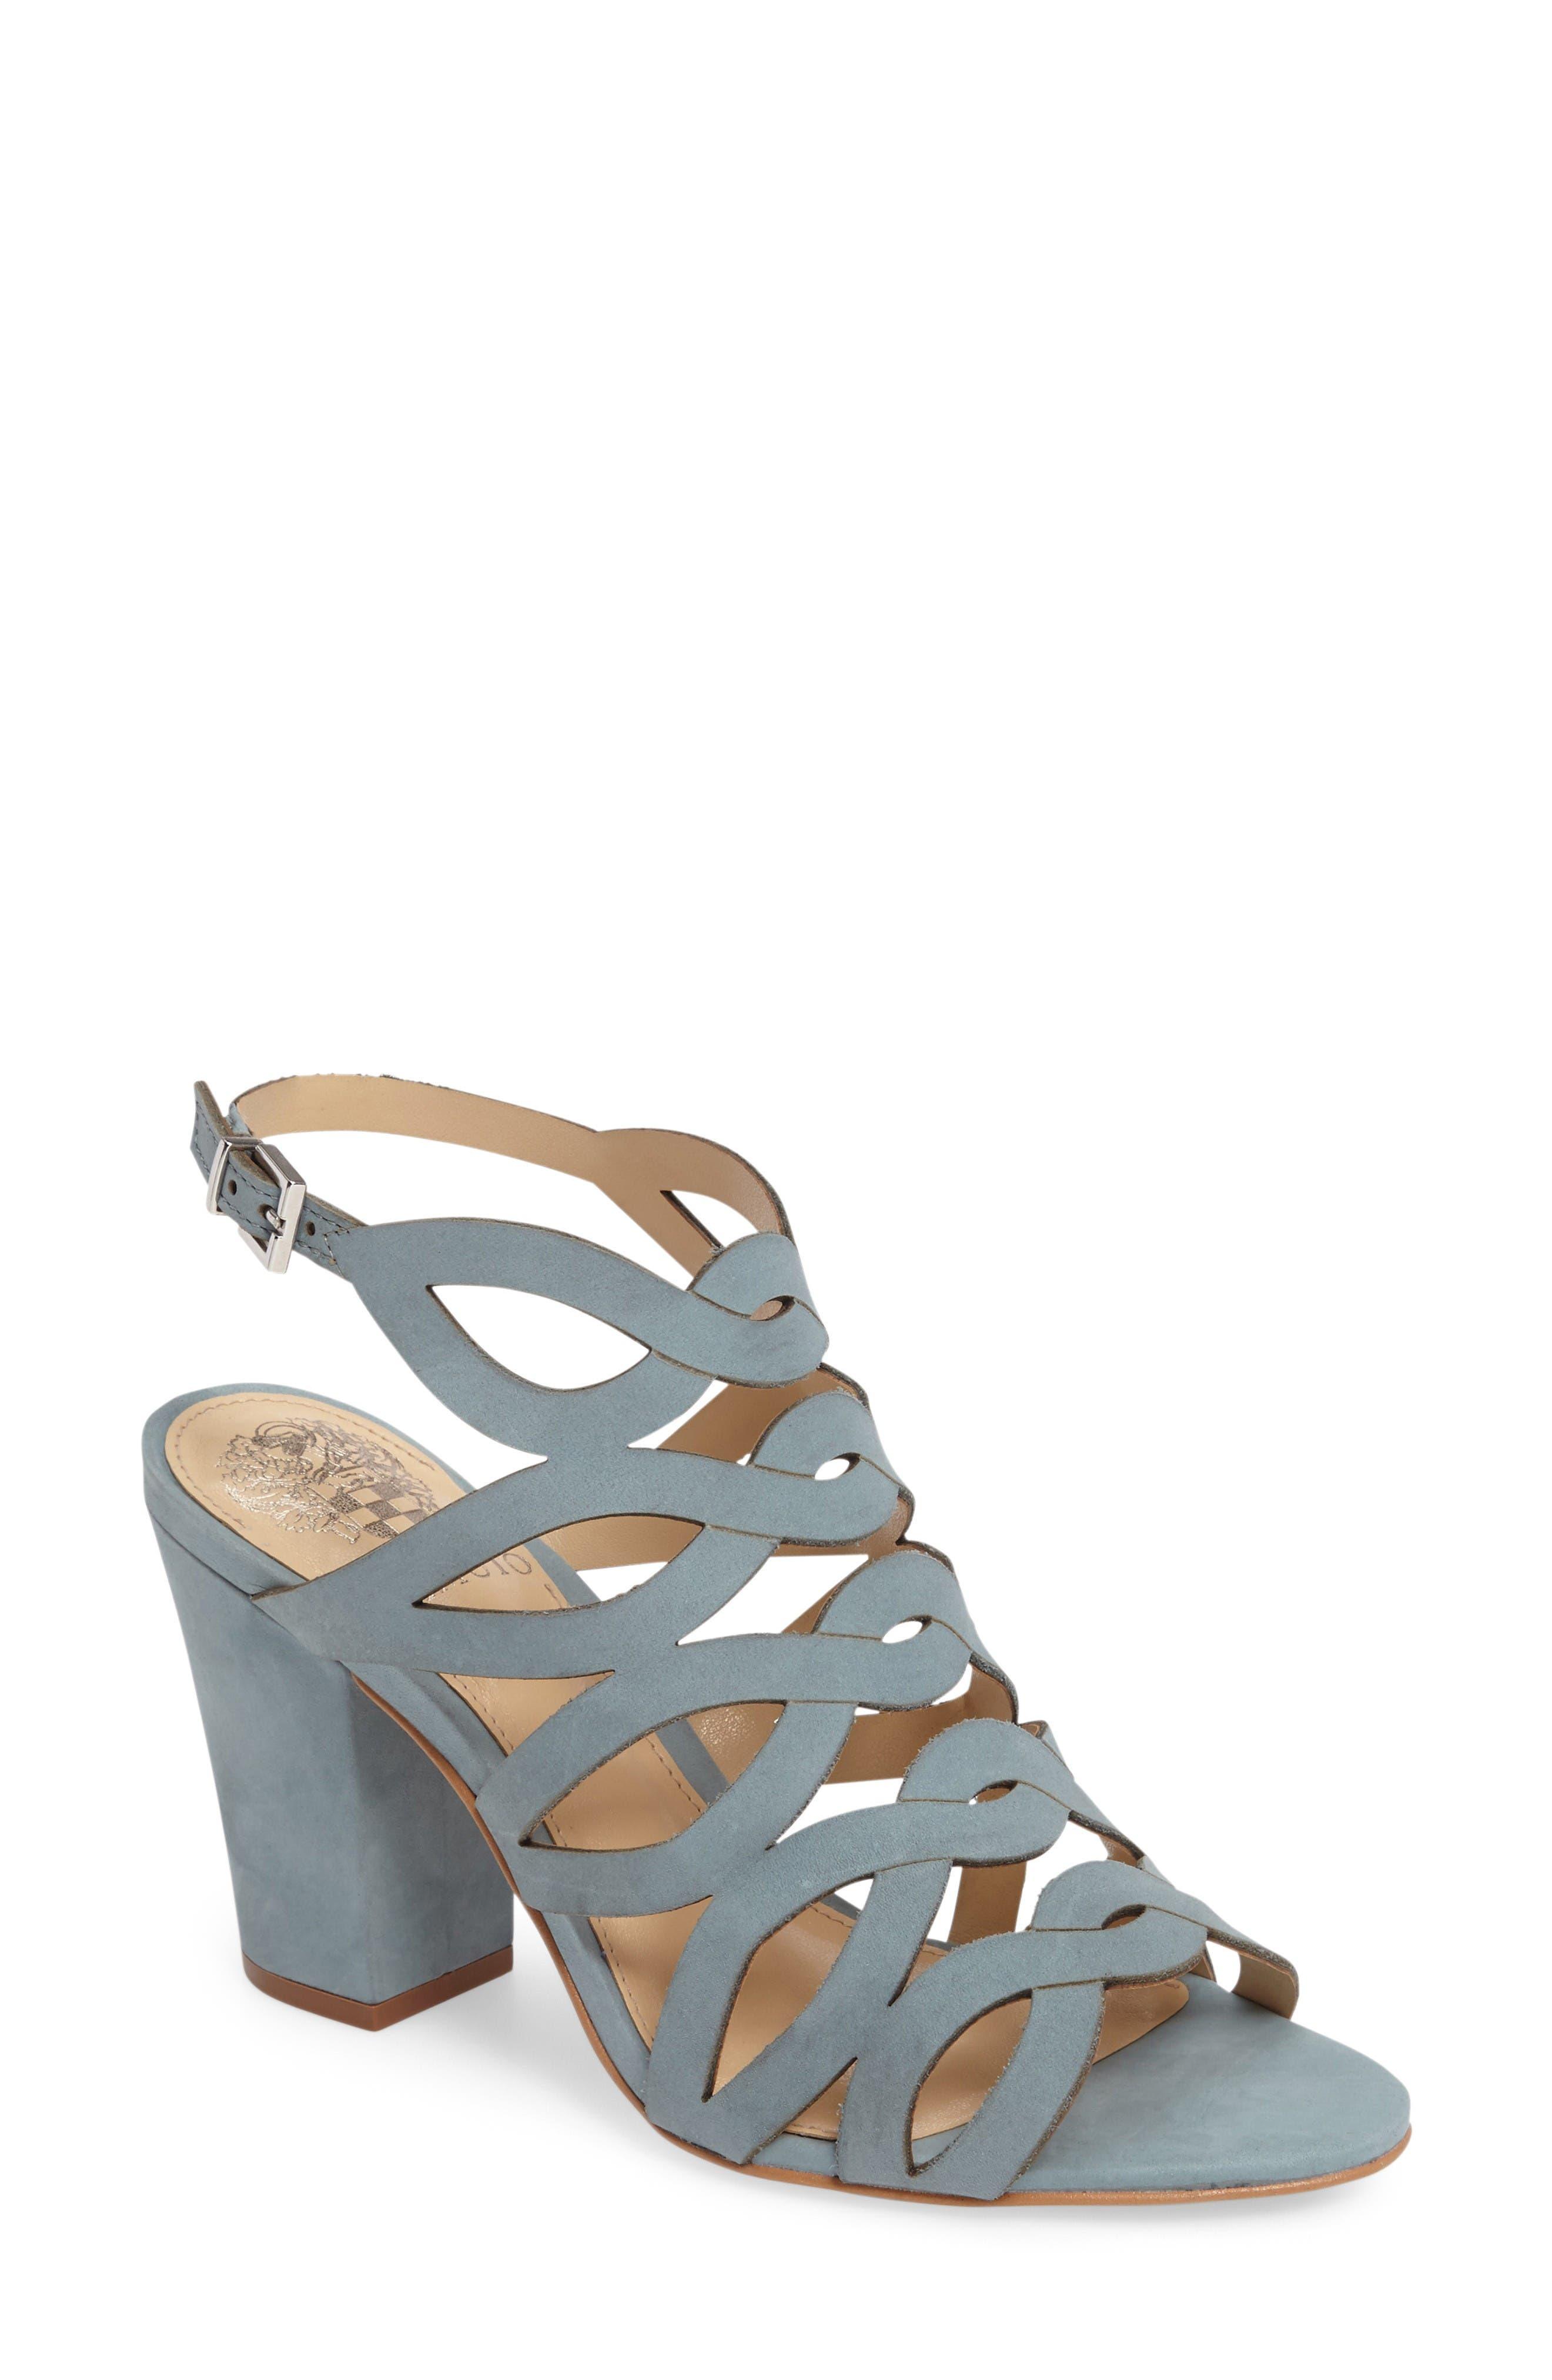 Alternate Image 1 Selected - Vince Camuto Norla Block Heel Sandal (Women)